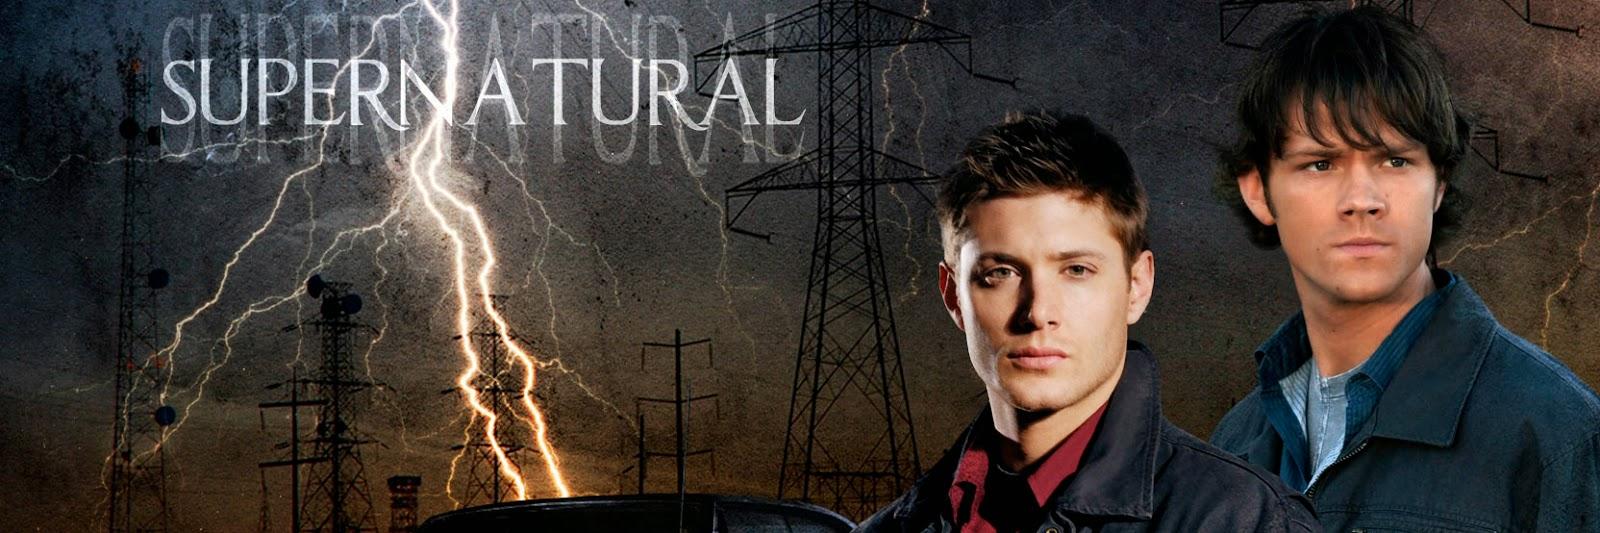 Assistir Supernatural 10 Temporada Online